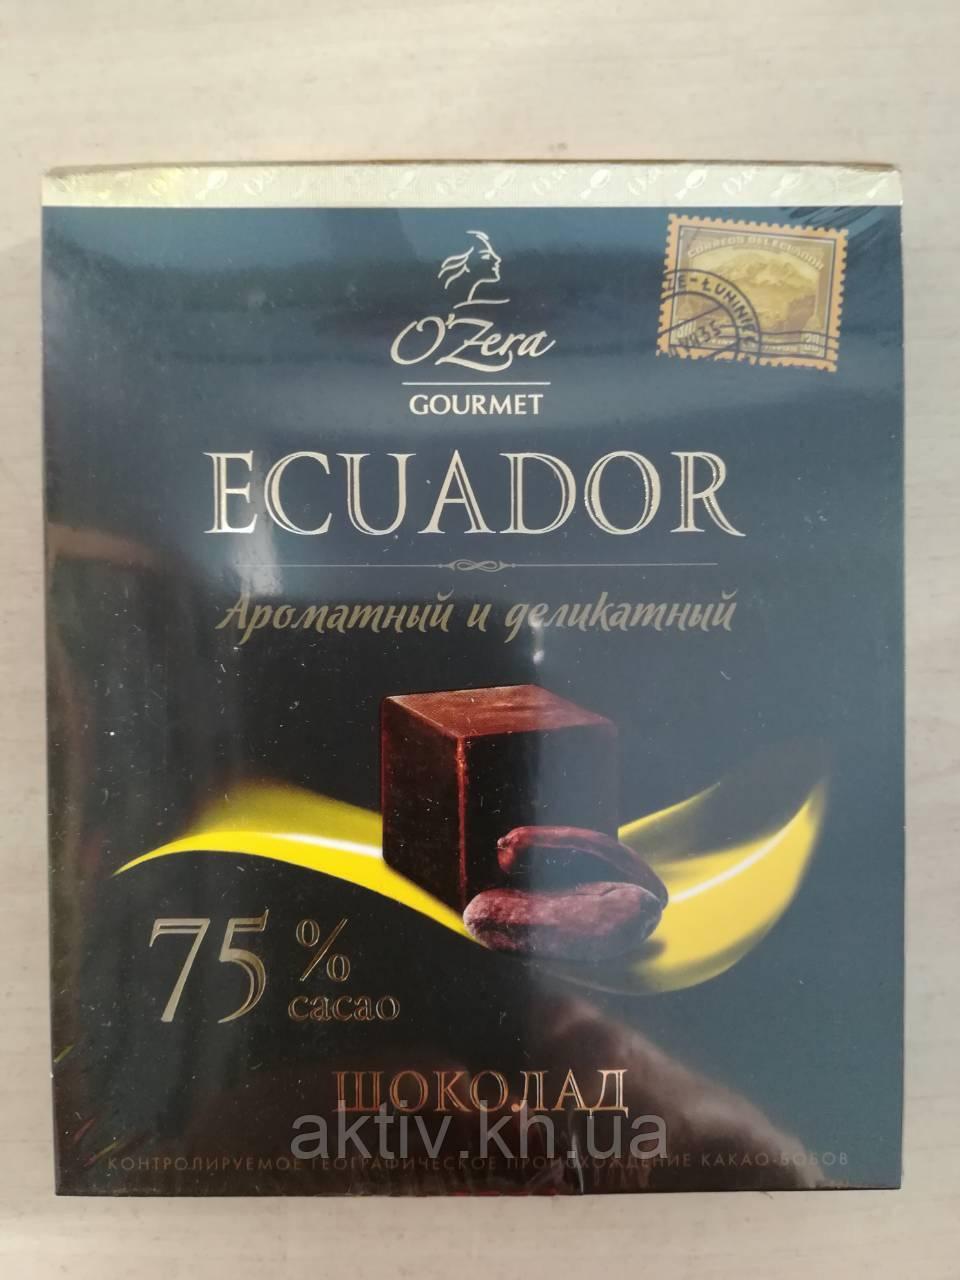 Шоколад Ozera Ecuador 90 гр